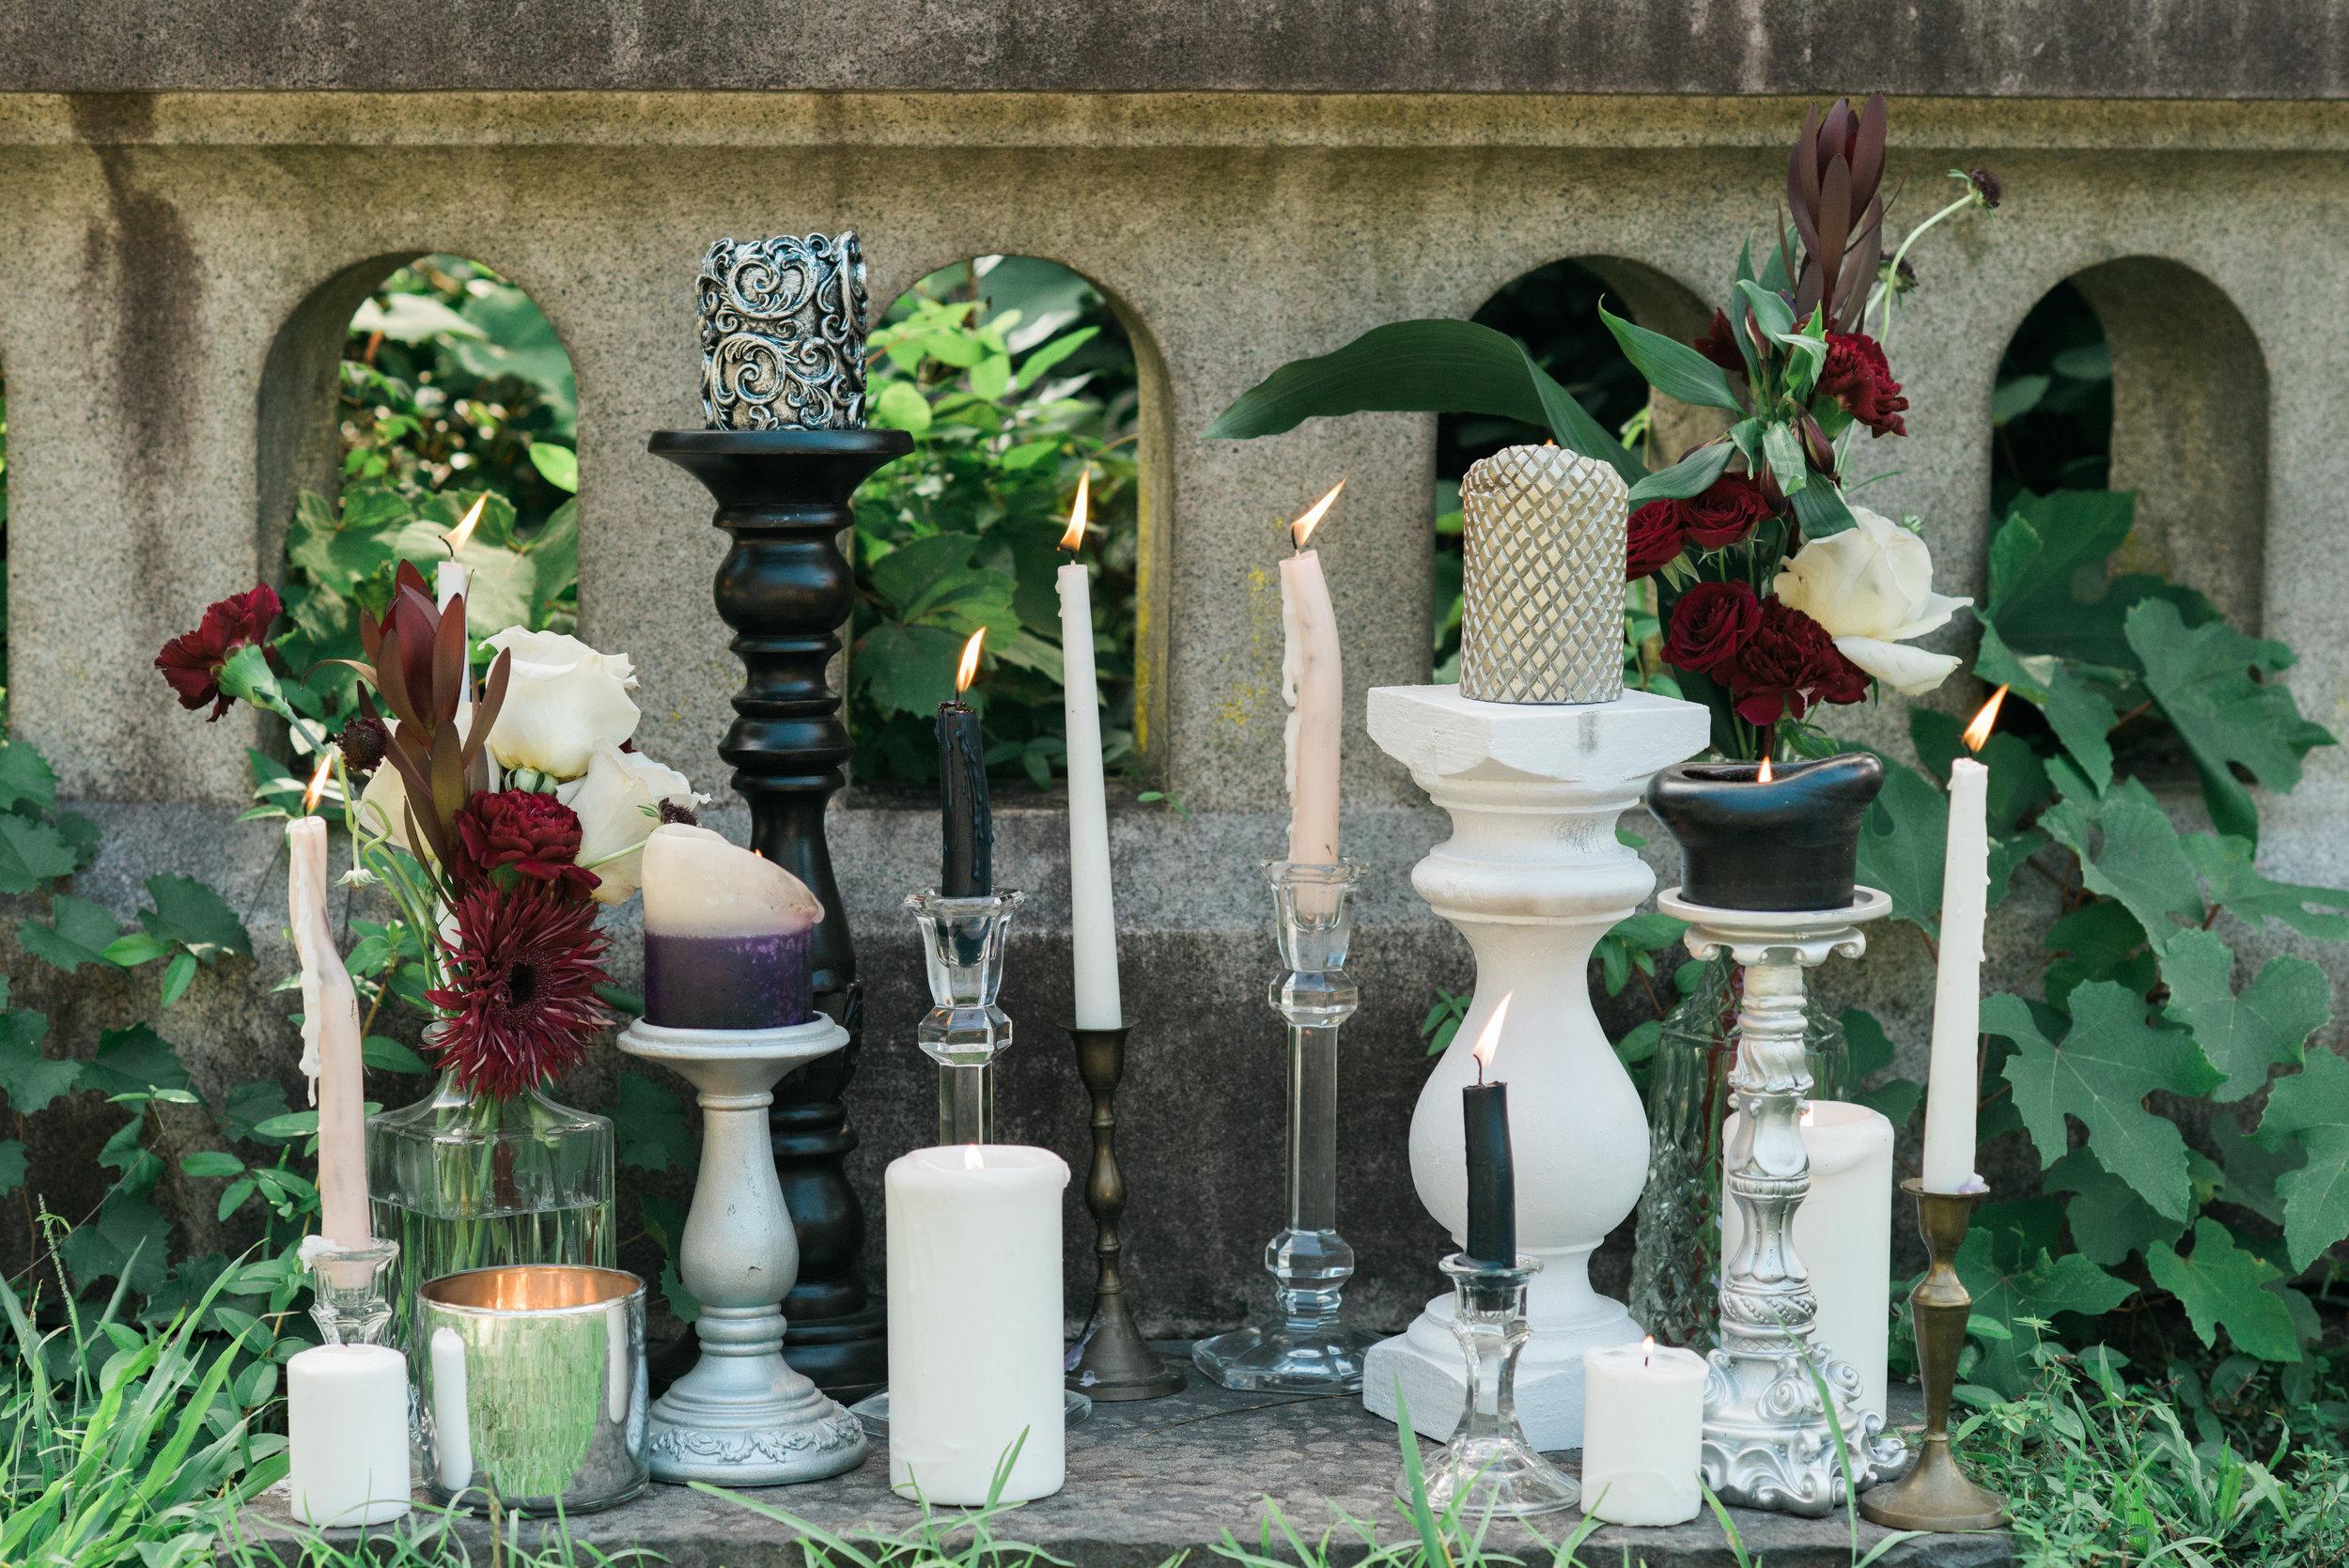 callie-beale-photography-Bonaventure-cemetery-michelle-royal-makeup-cemetery-wedding-ivory-and-beau-wedding-planning-anna-campbell-harper-savannah-bridal-boutique-savannah-wedding-dresses-savannah-weddings-13.jpg